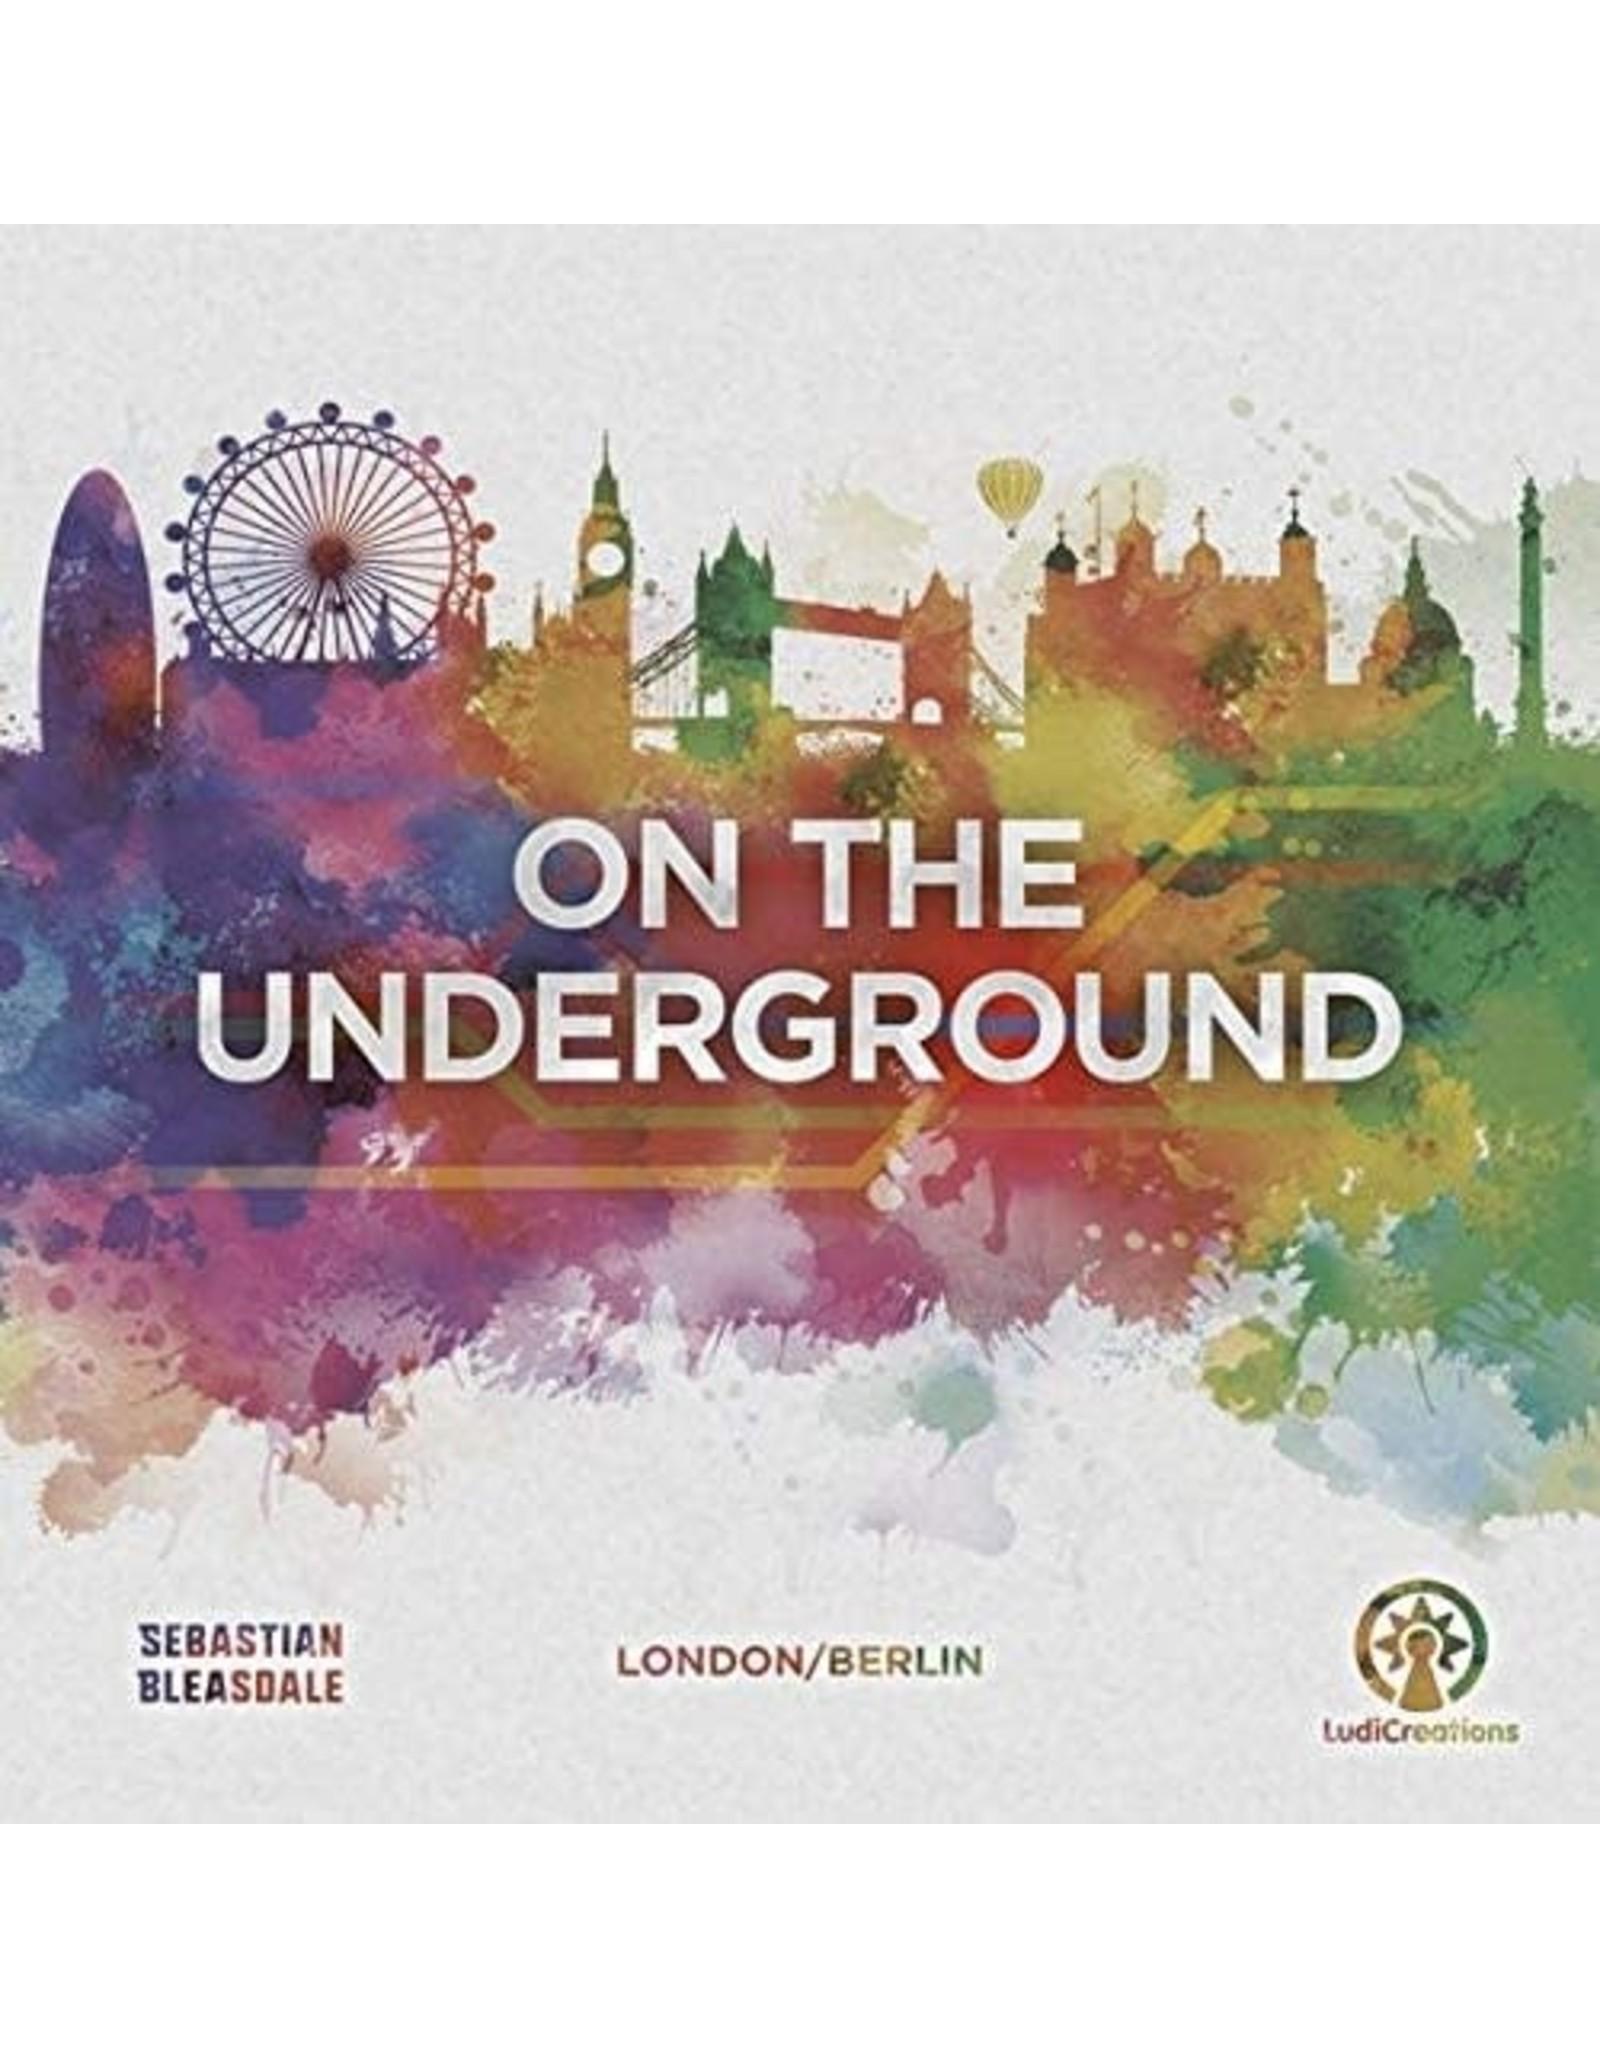 LudiCreations On the Underground: London/Berlin